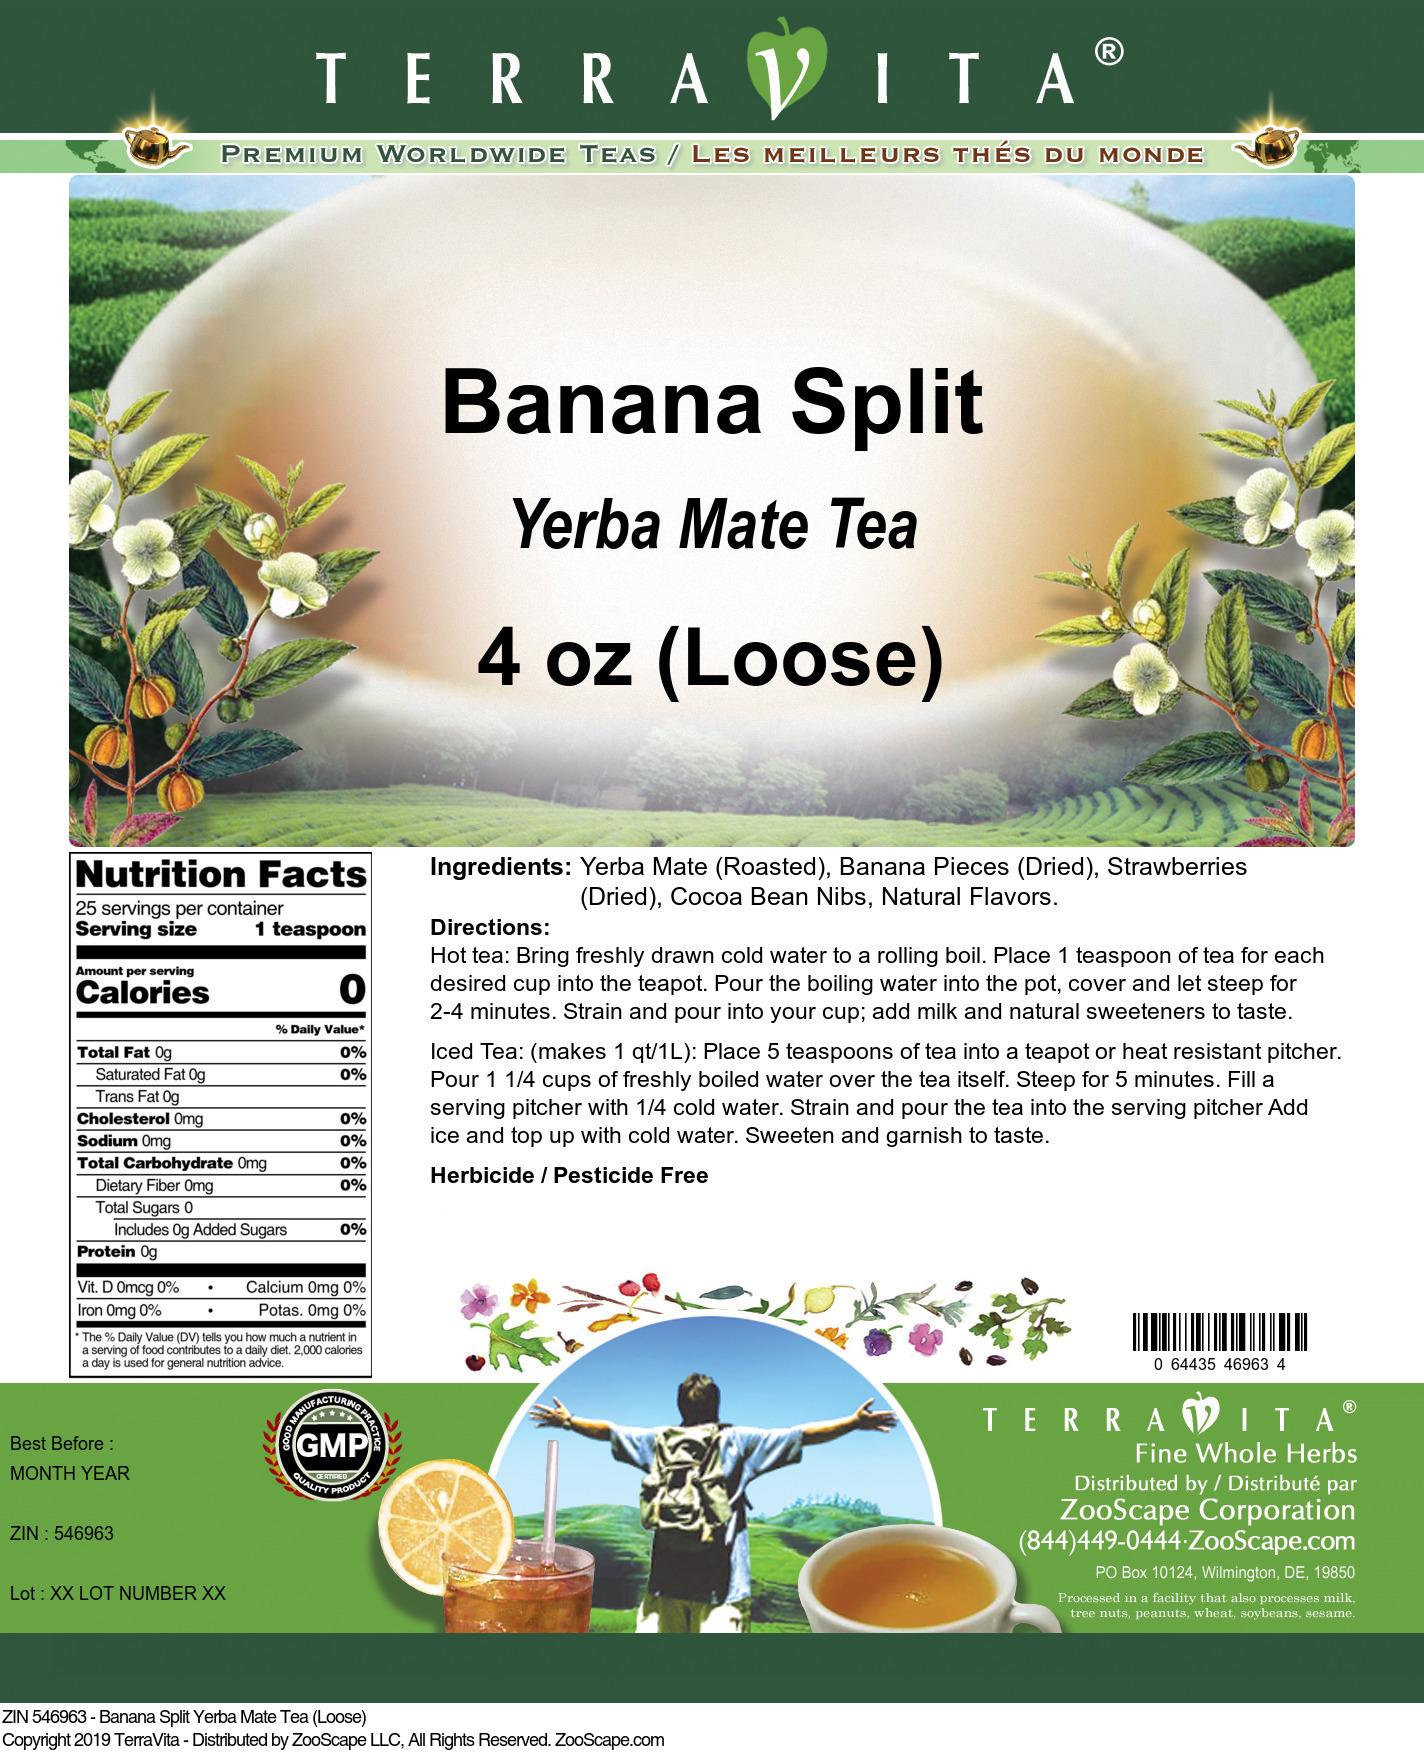 Banana Split Yerba Mate Tea (Loose)